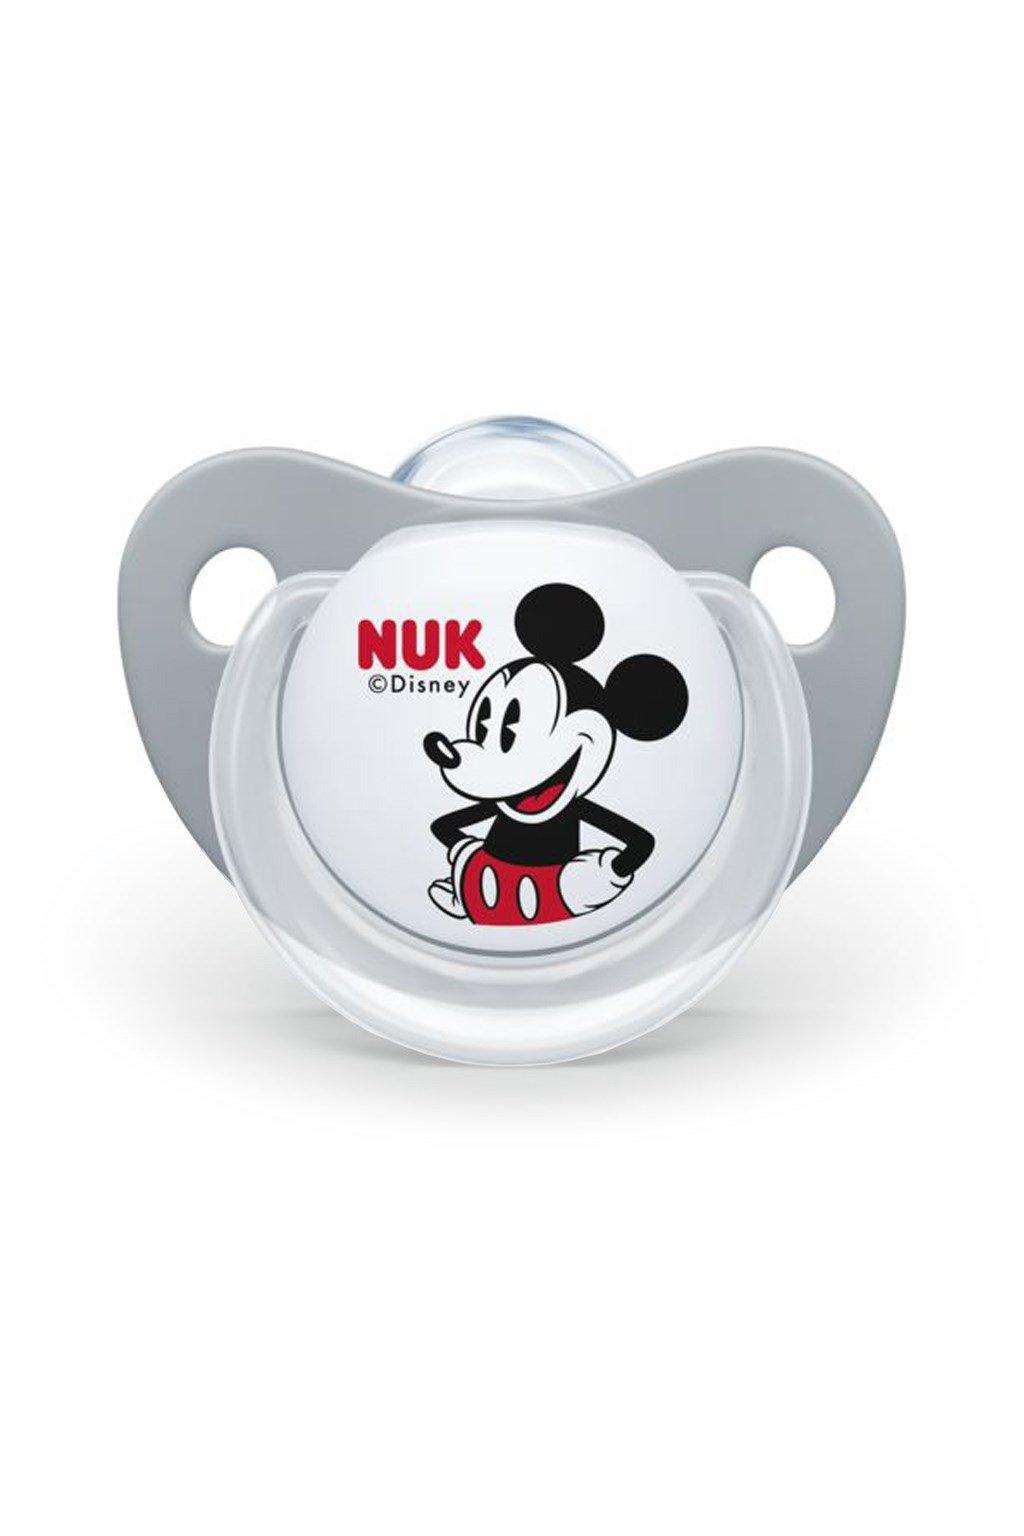 Cumlík Trendline NUK Disney Mickey Minnie 0-6m sivý Box